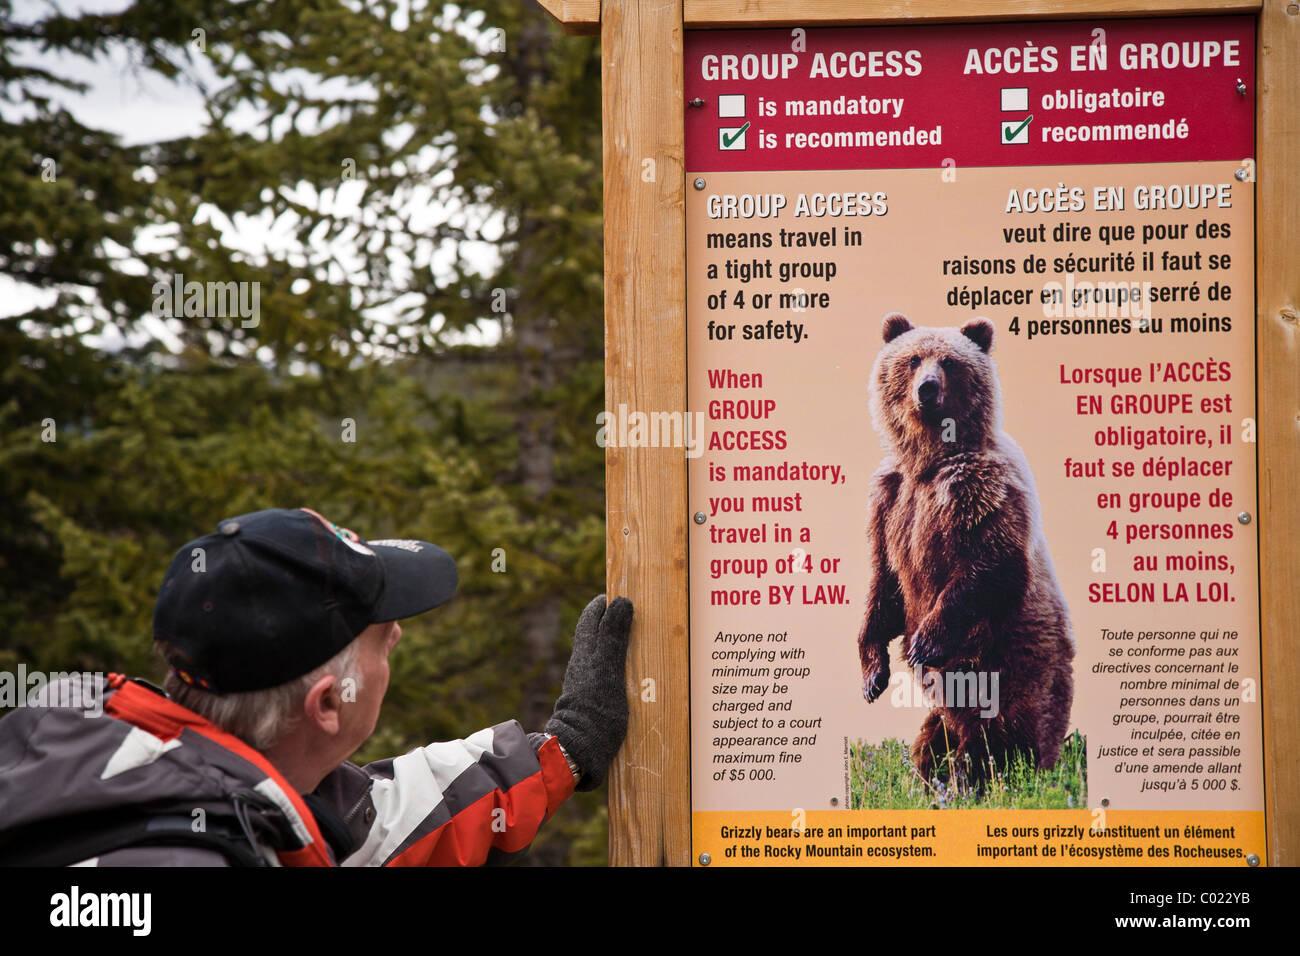 Bear man picture tgp authoritative